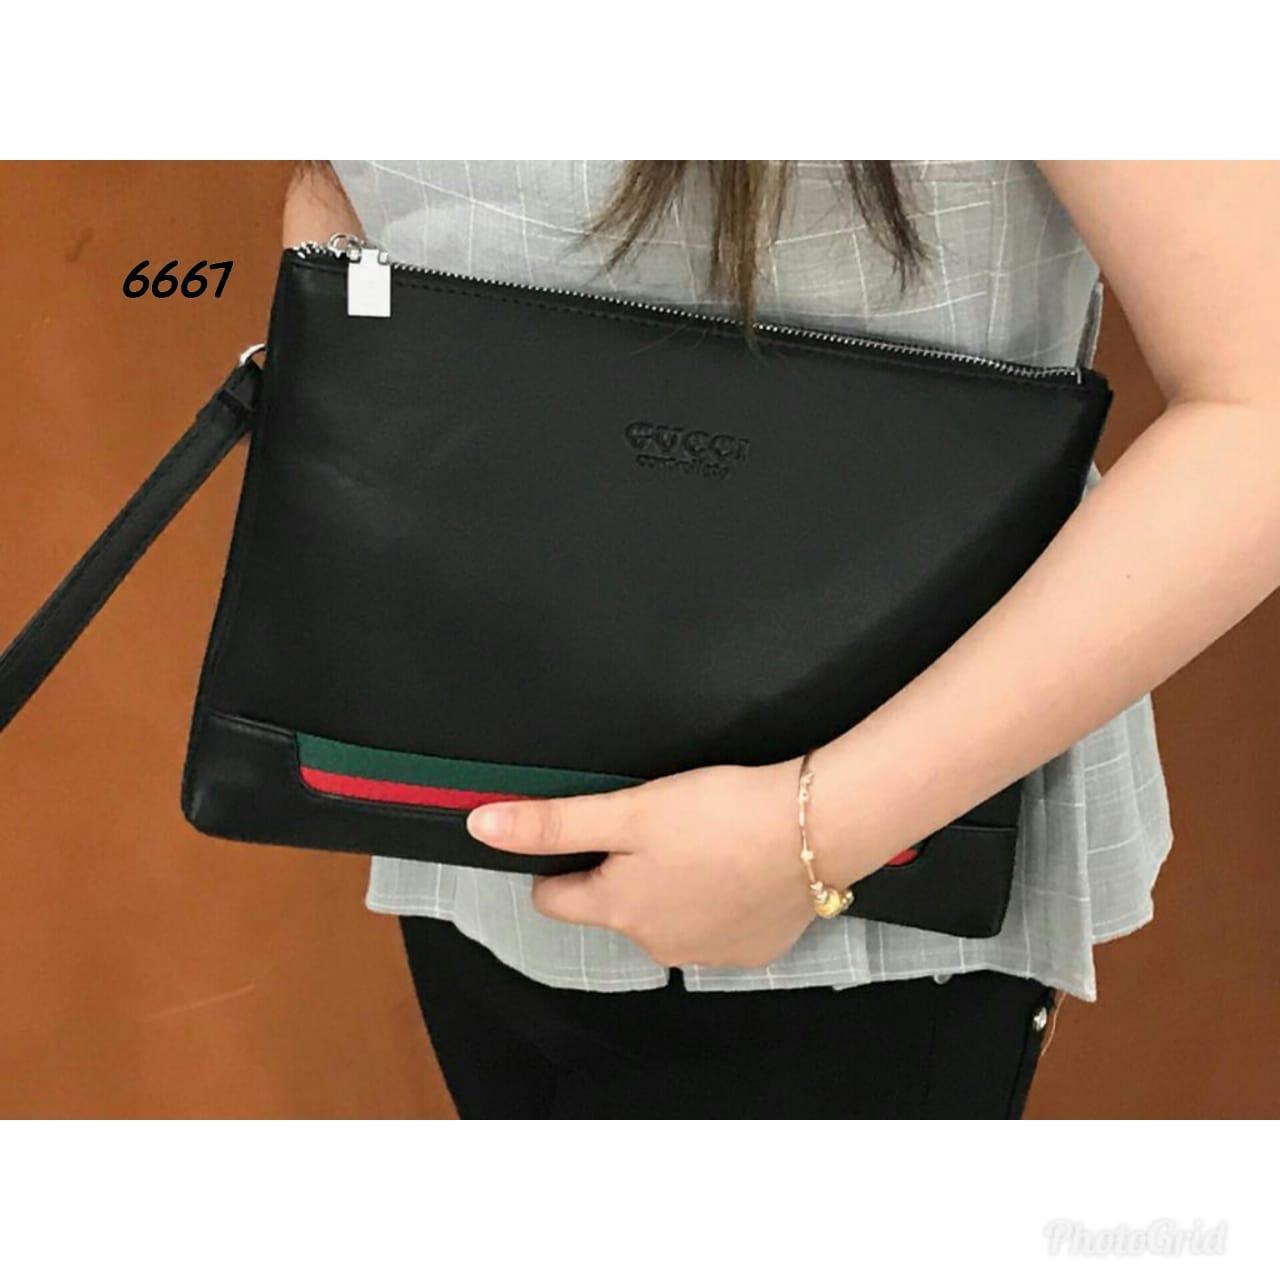 Clutch Gucci Big Size 6667 6668 Fashion Wanita Tas Import Grosir Dompet  Clutches Handbag Trendy . 6758e9eb6b